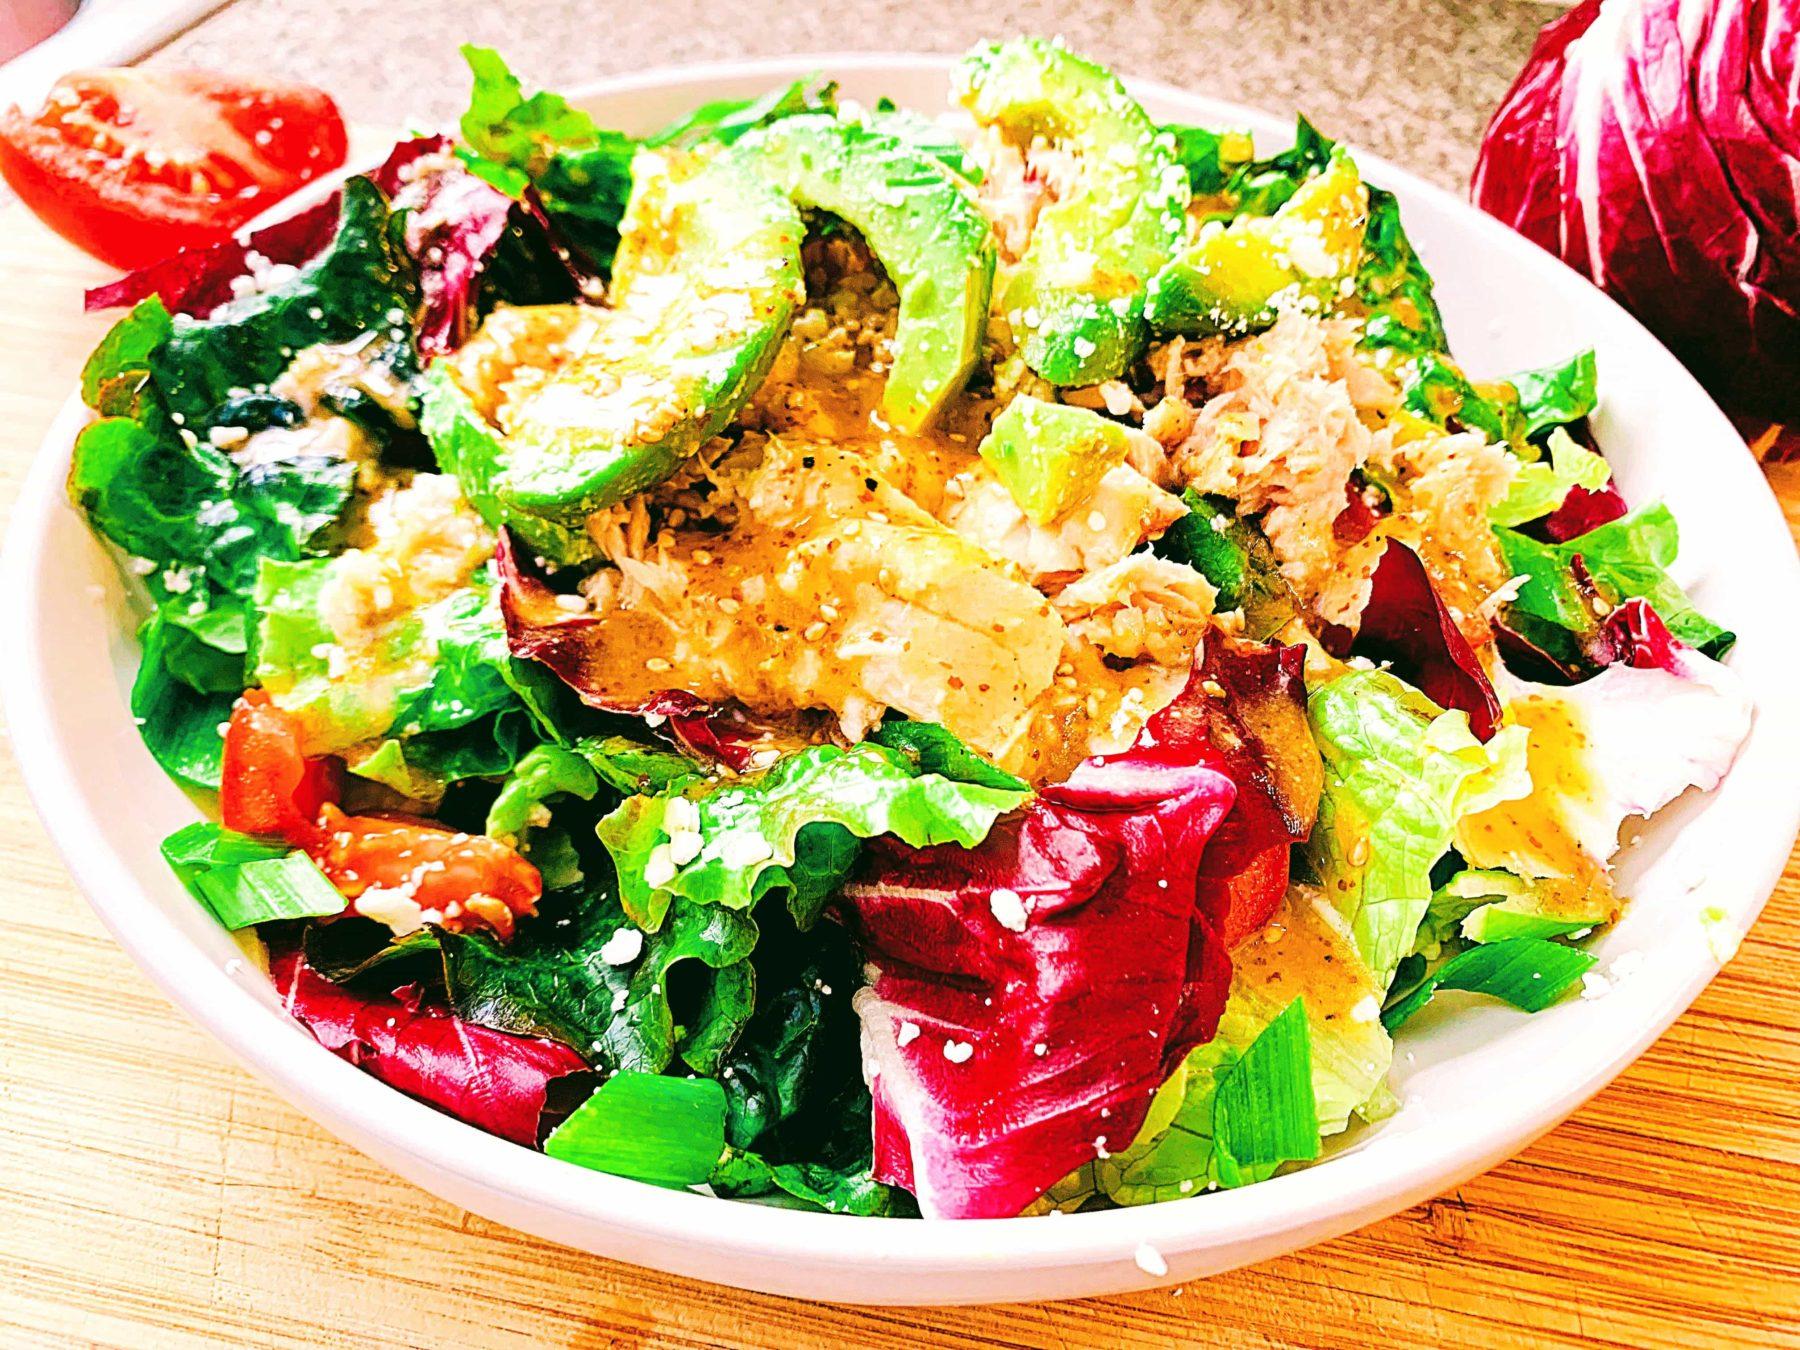 Tuna Avocado Salad with Sesame Honey Maple Dressing